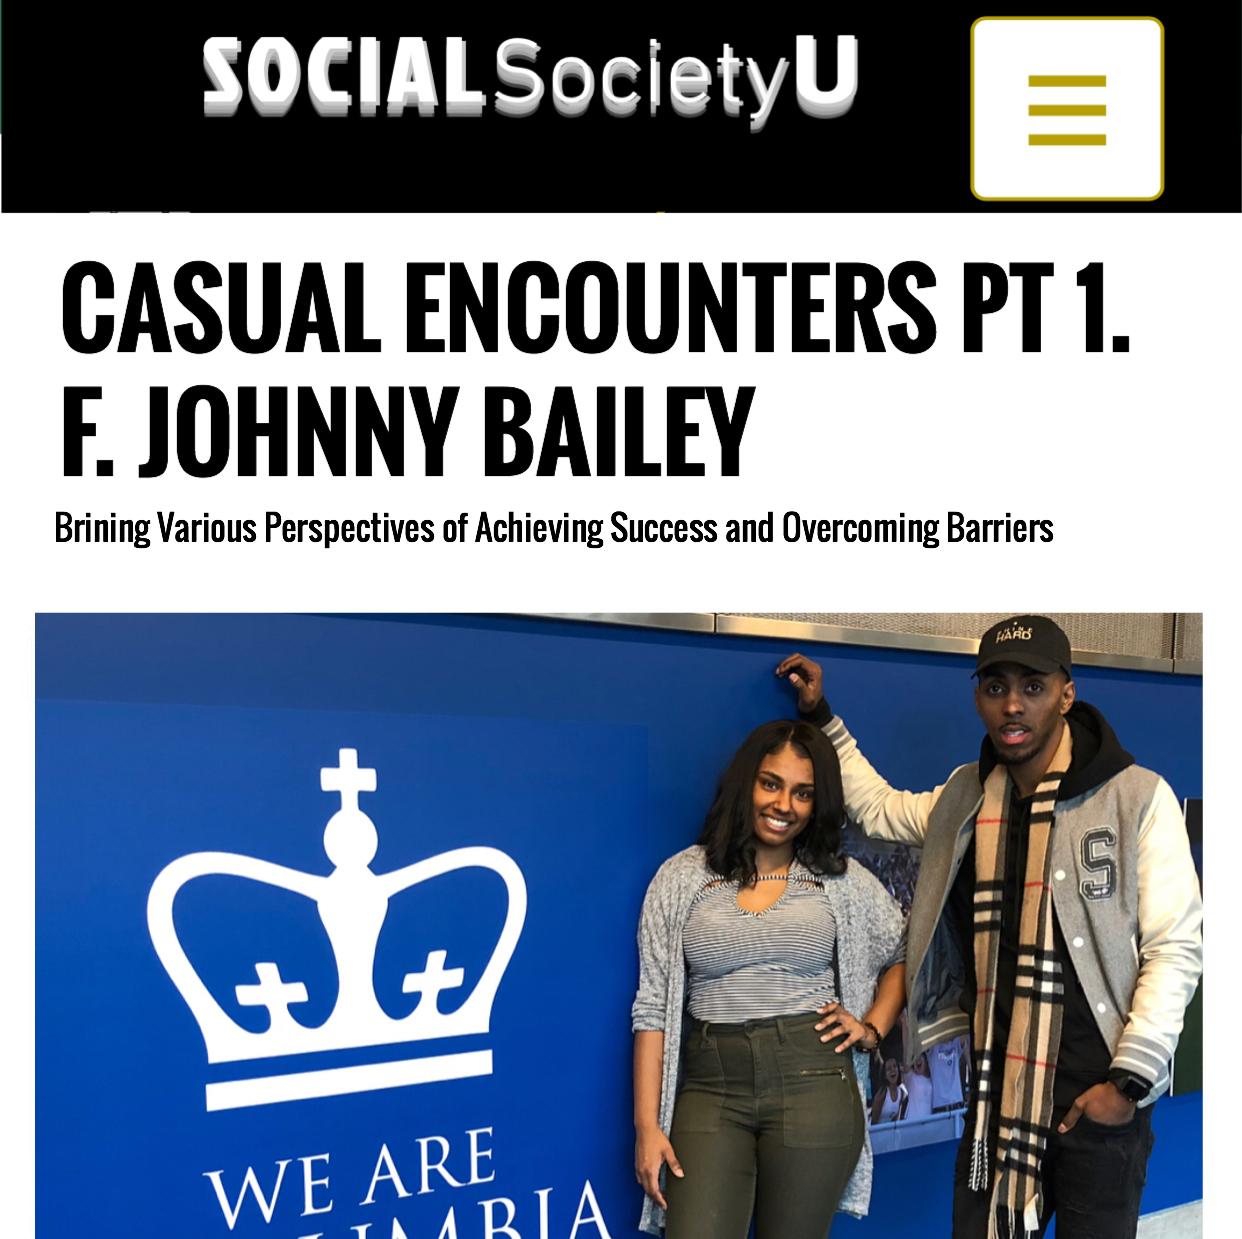 Social Society U